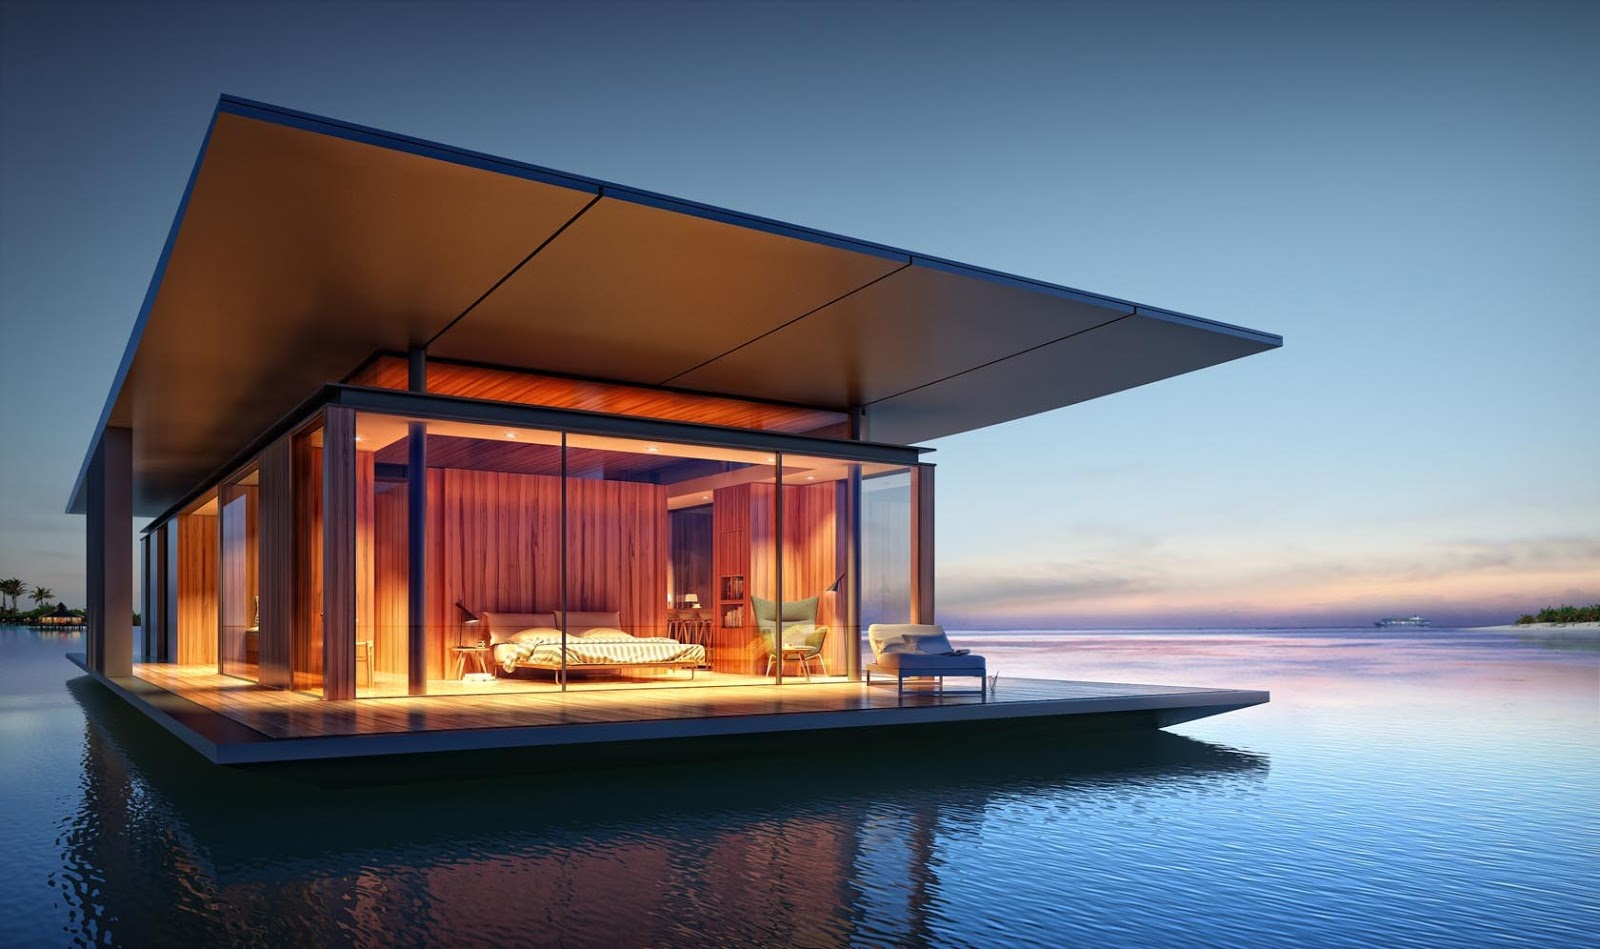 Home Design VN Home Design Ideas Home Decor DIY Furniture - Modern mobile home design